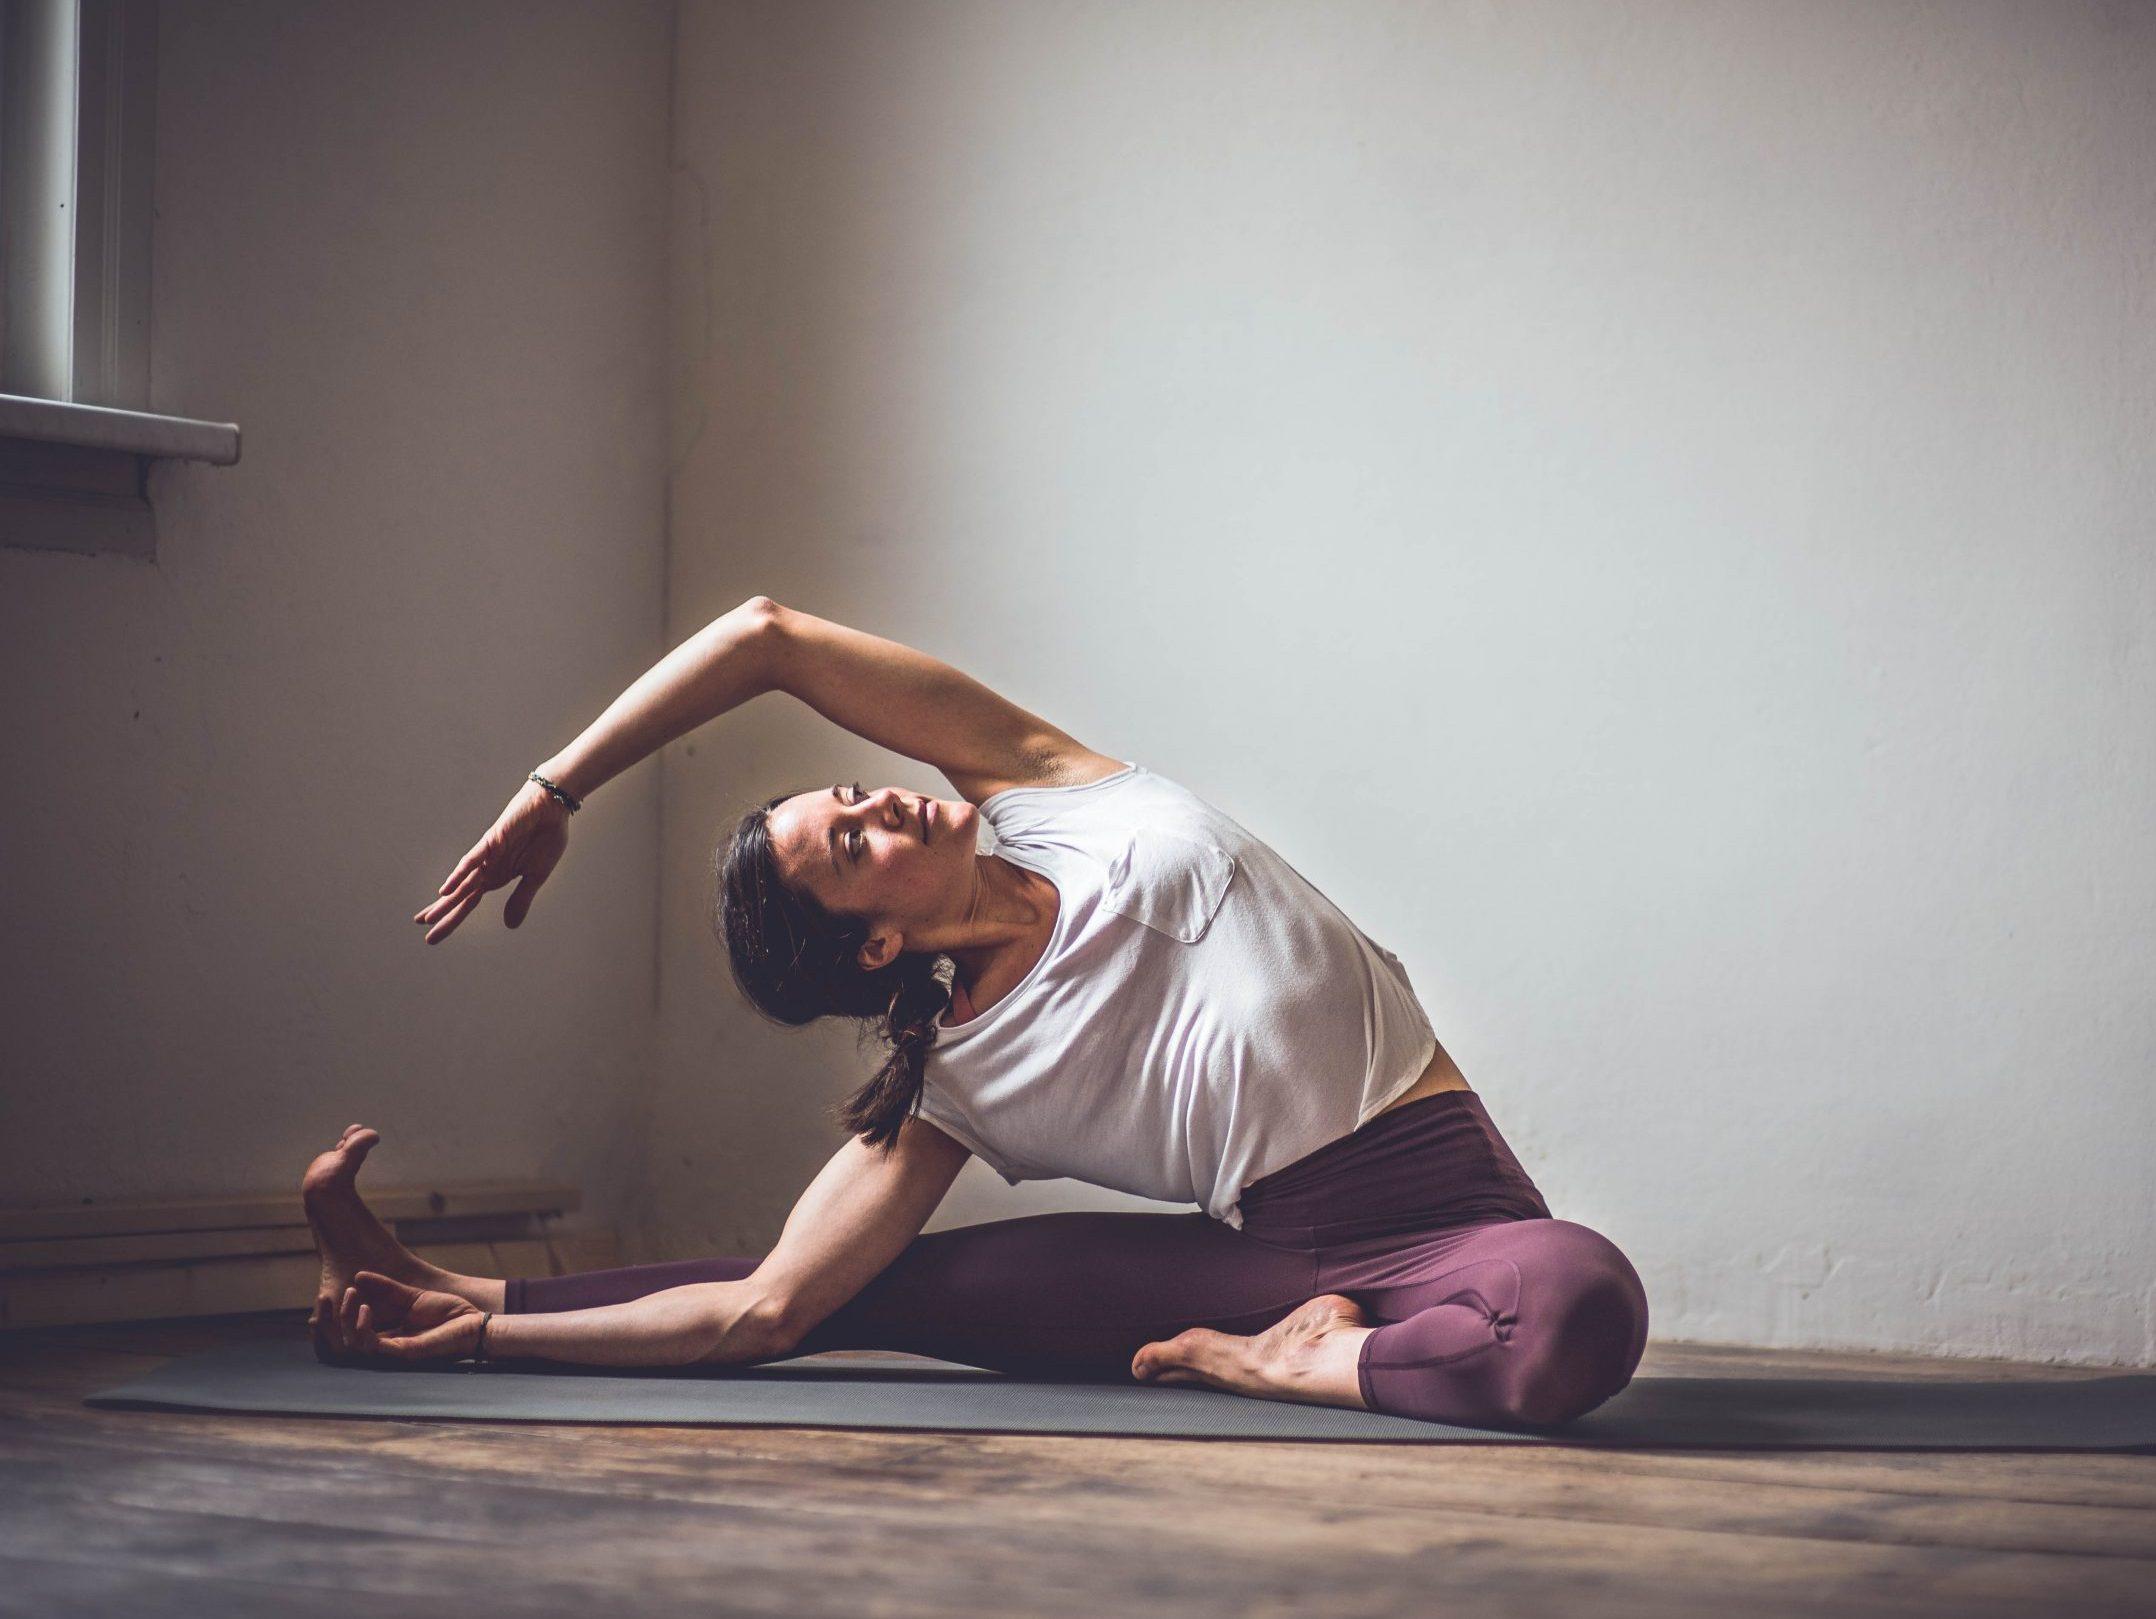 Anusara Yoga scaled e1610811438351 - LP - Morgenroutine Sanfte Entfaltung